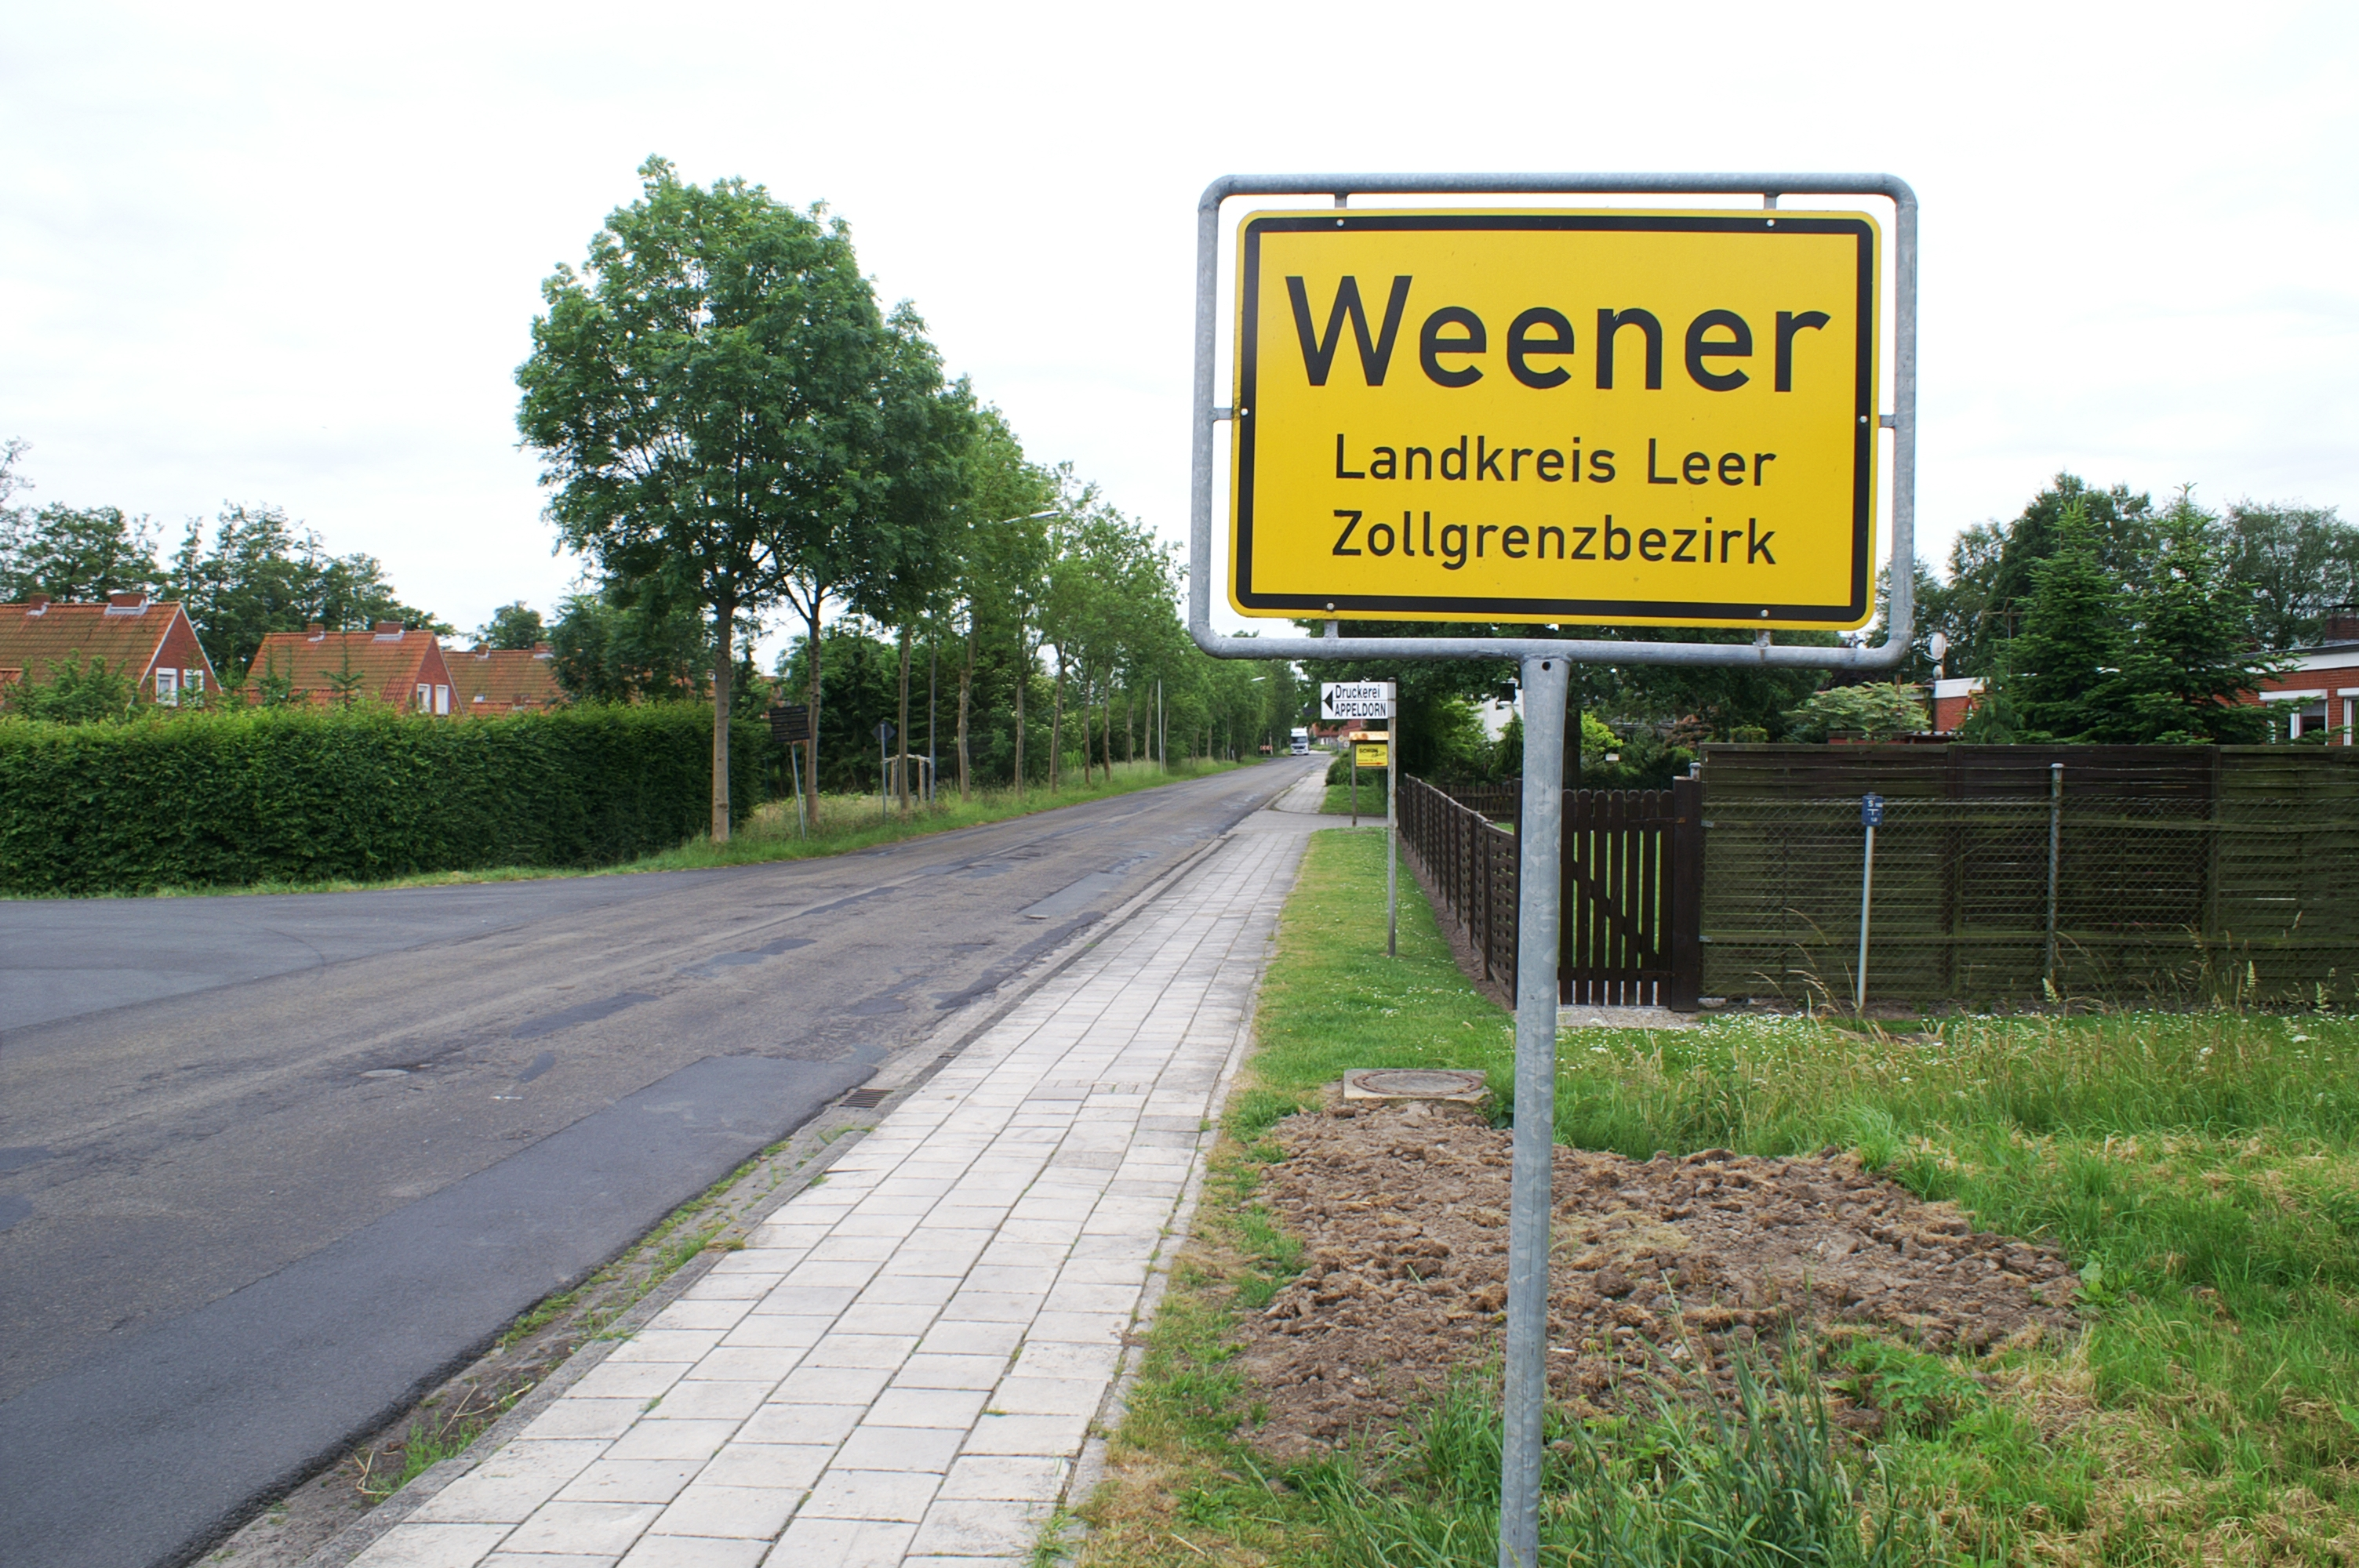 Single weener